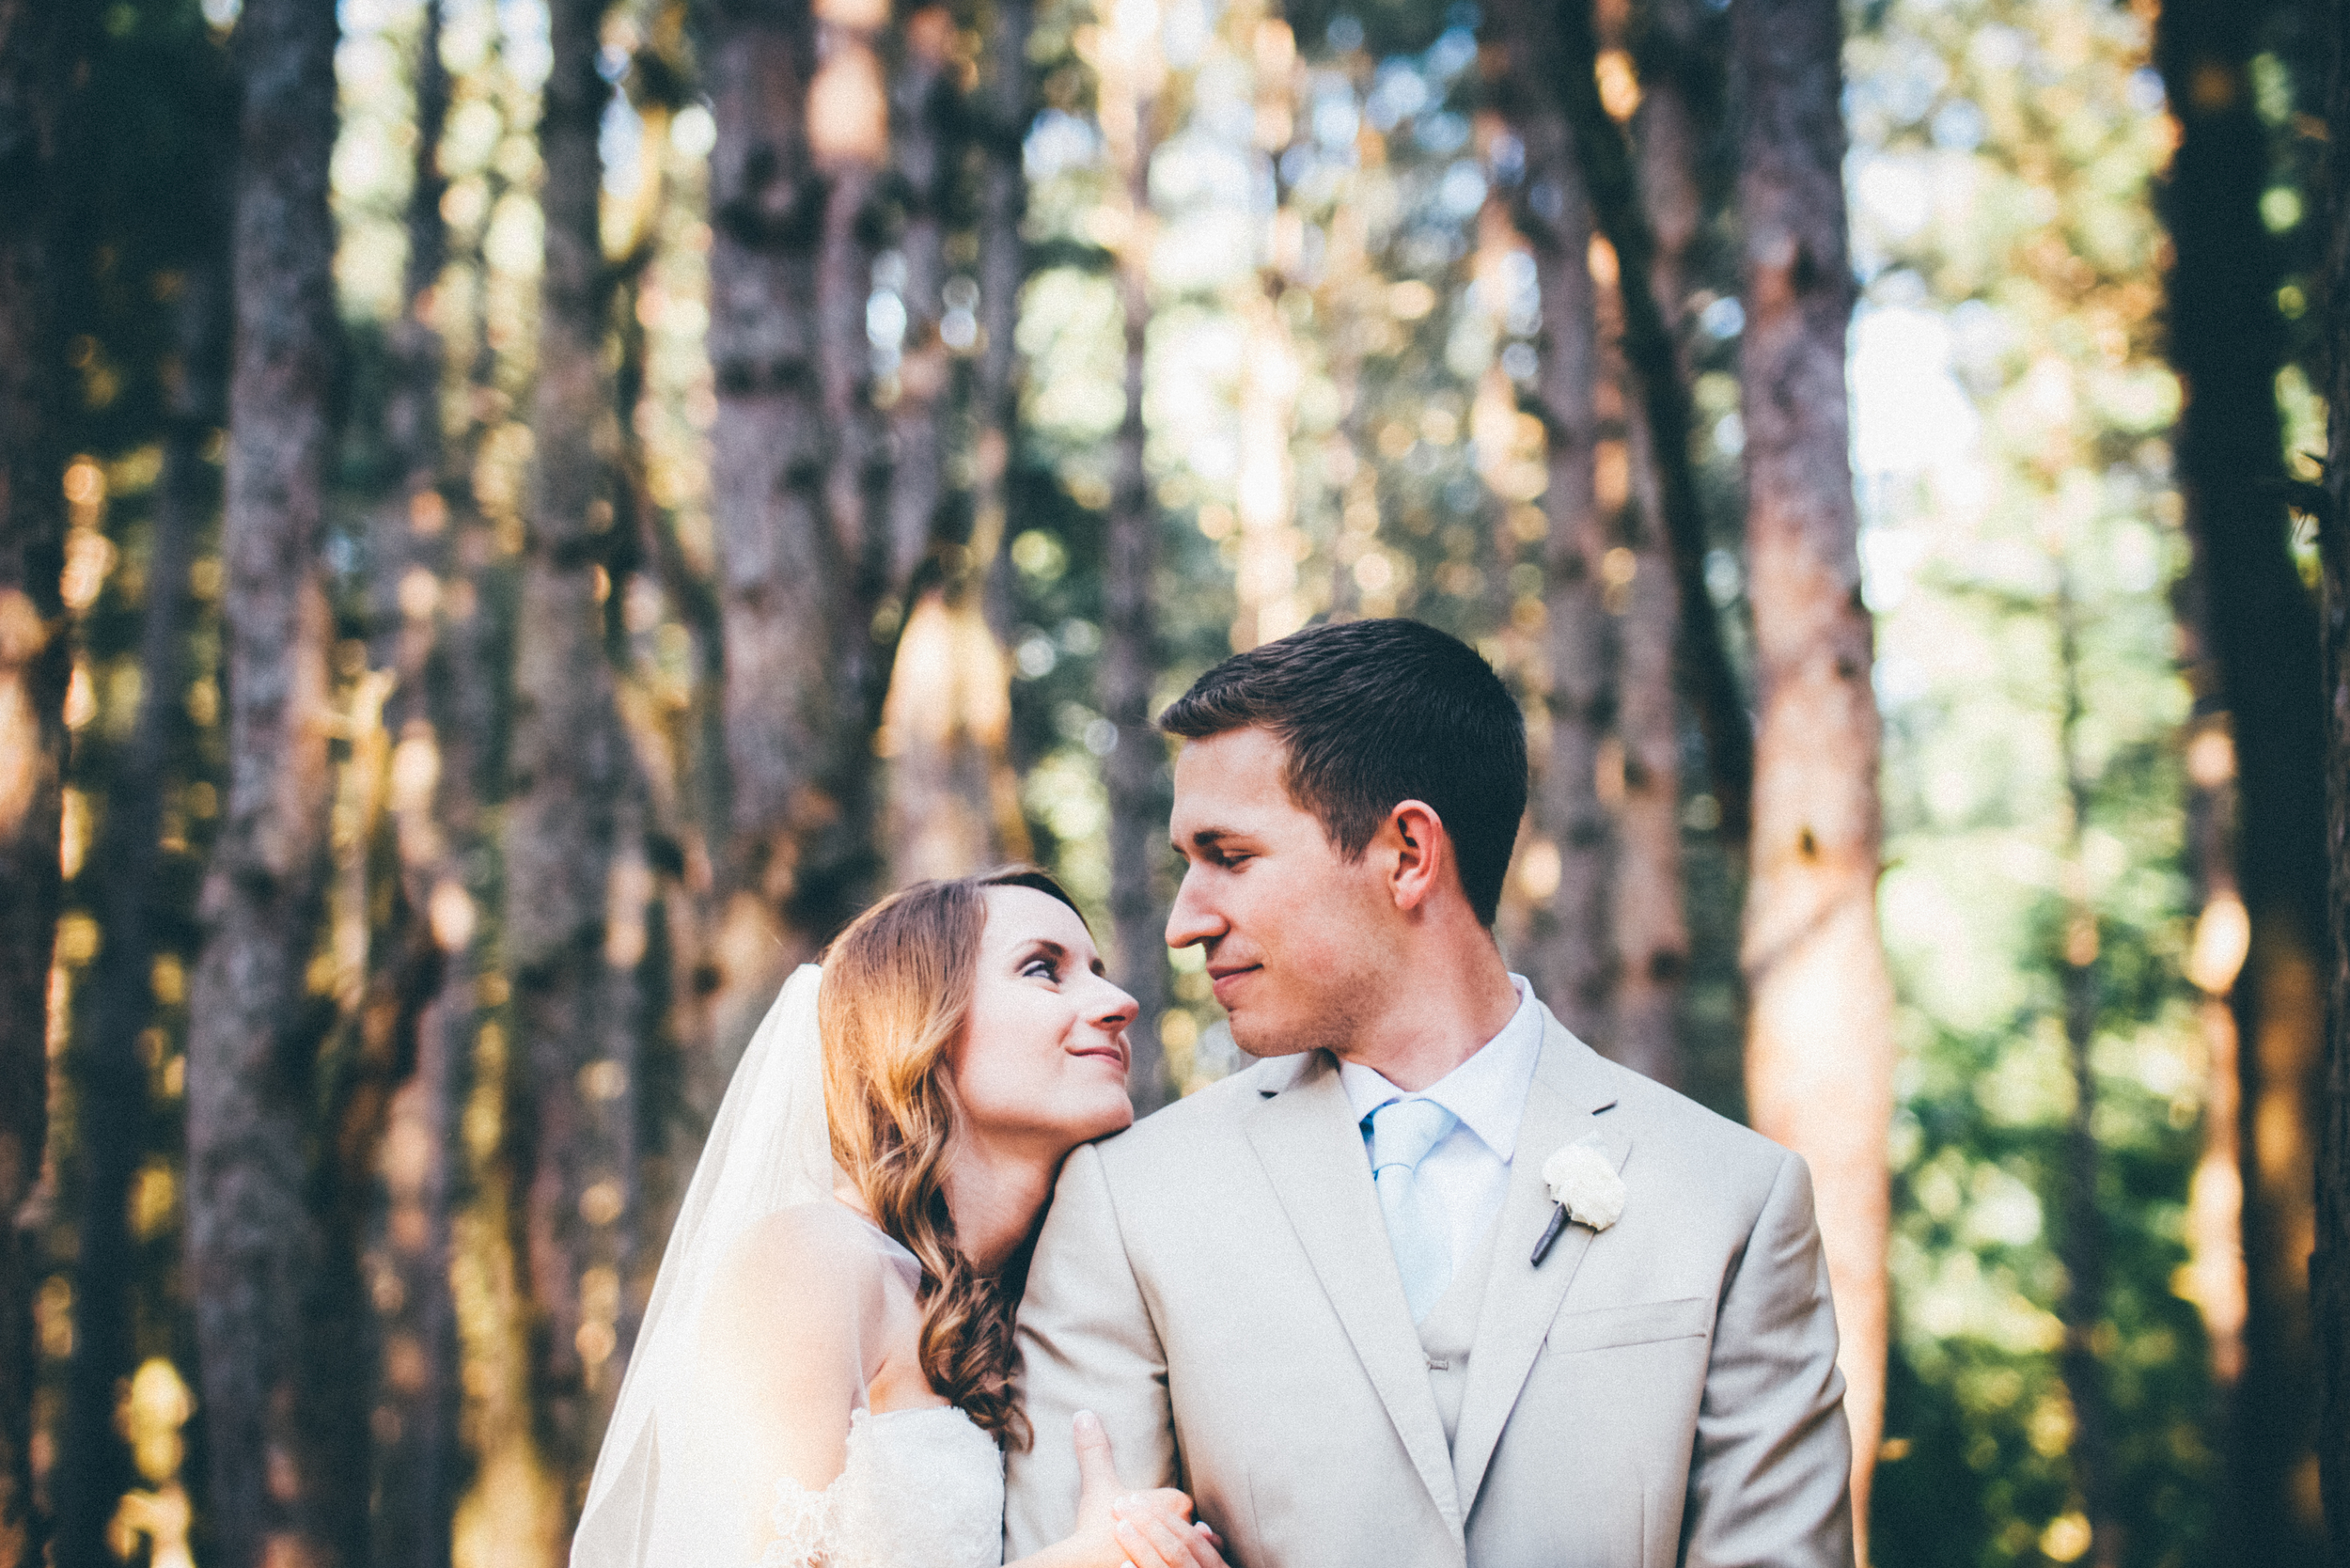 Grand-Rapids-Michigan-Wedding-Photographer-Cinematographer-Shadow-Shine-Pictures-Josh-Cassie-Teigen-Schoonmaker-005